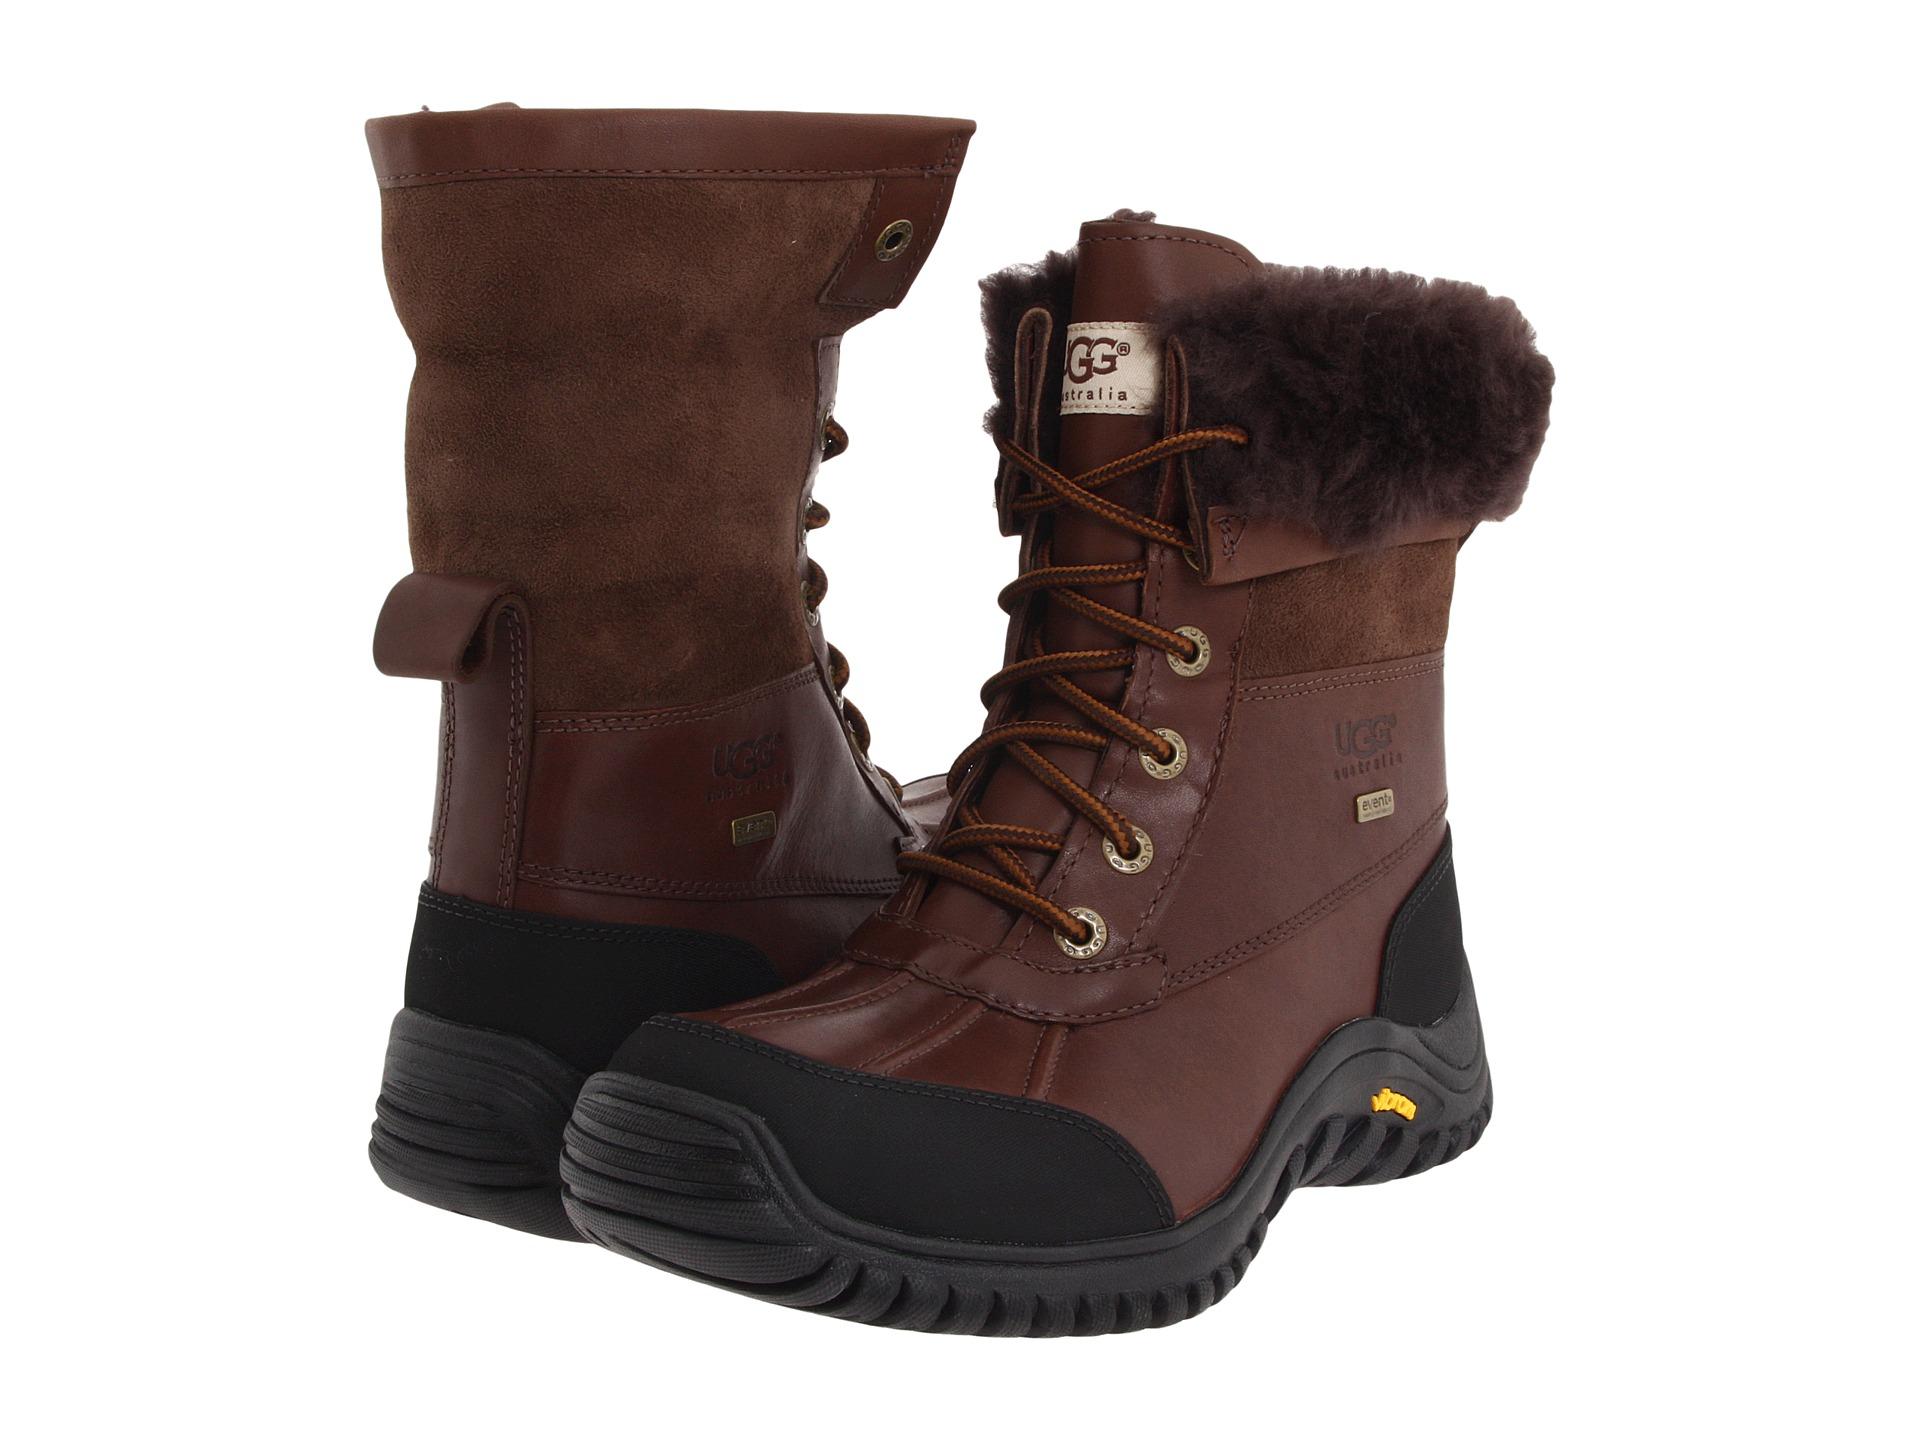 ugg adirondack boot ii zappos free shipping both ways